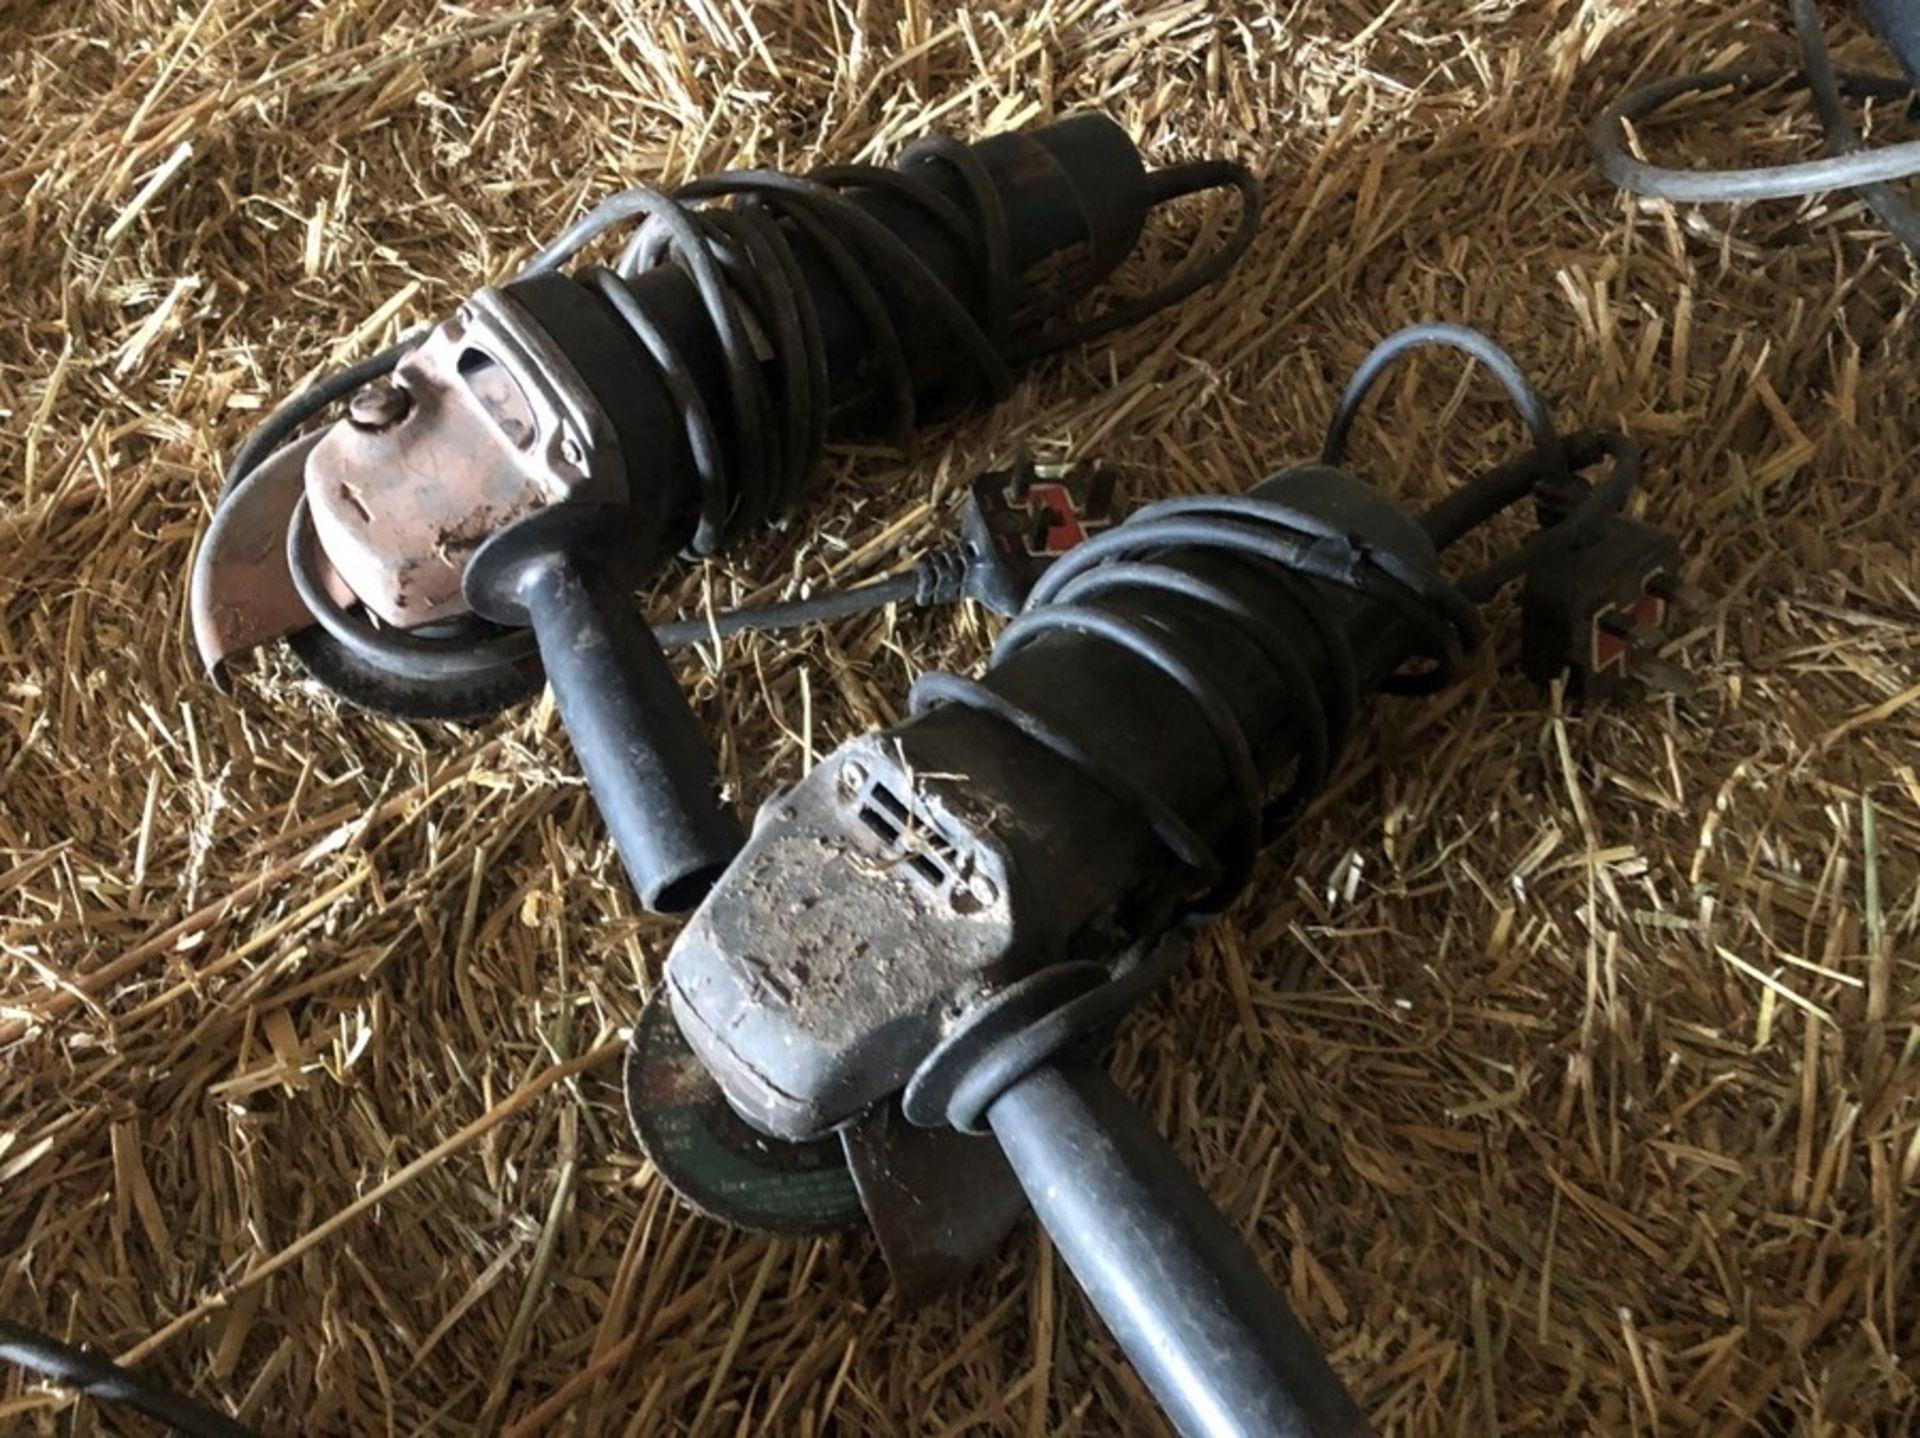 Bosch GWS & Bosch PWS angle grinders - Failed PAT test